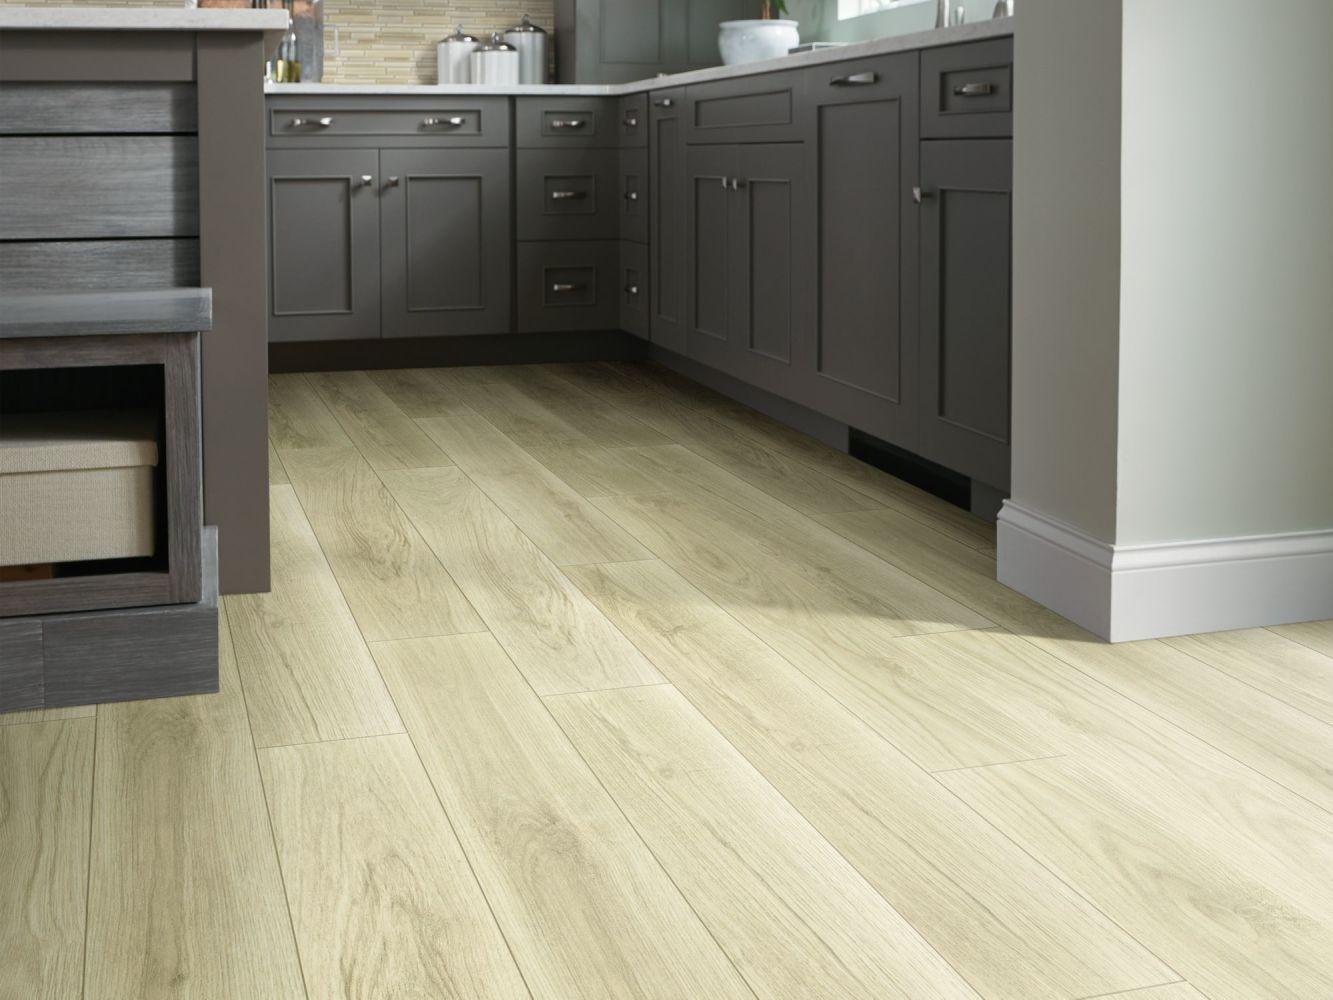 Shaw Floors Resilient Residential Tivoli Plus Tuscany 01004_0845V